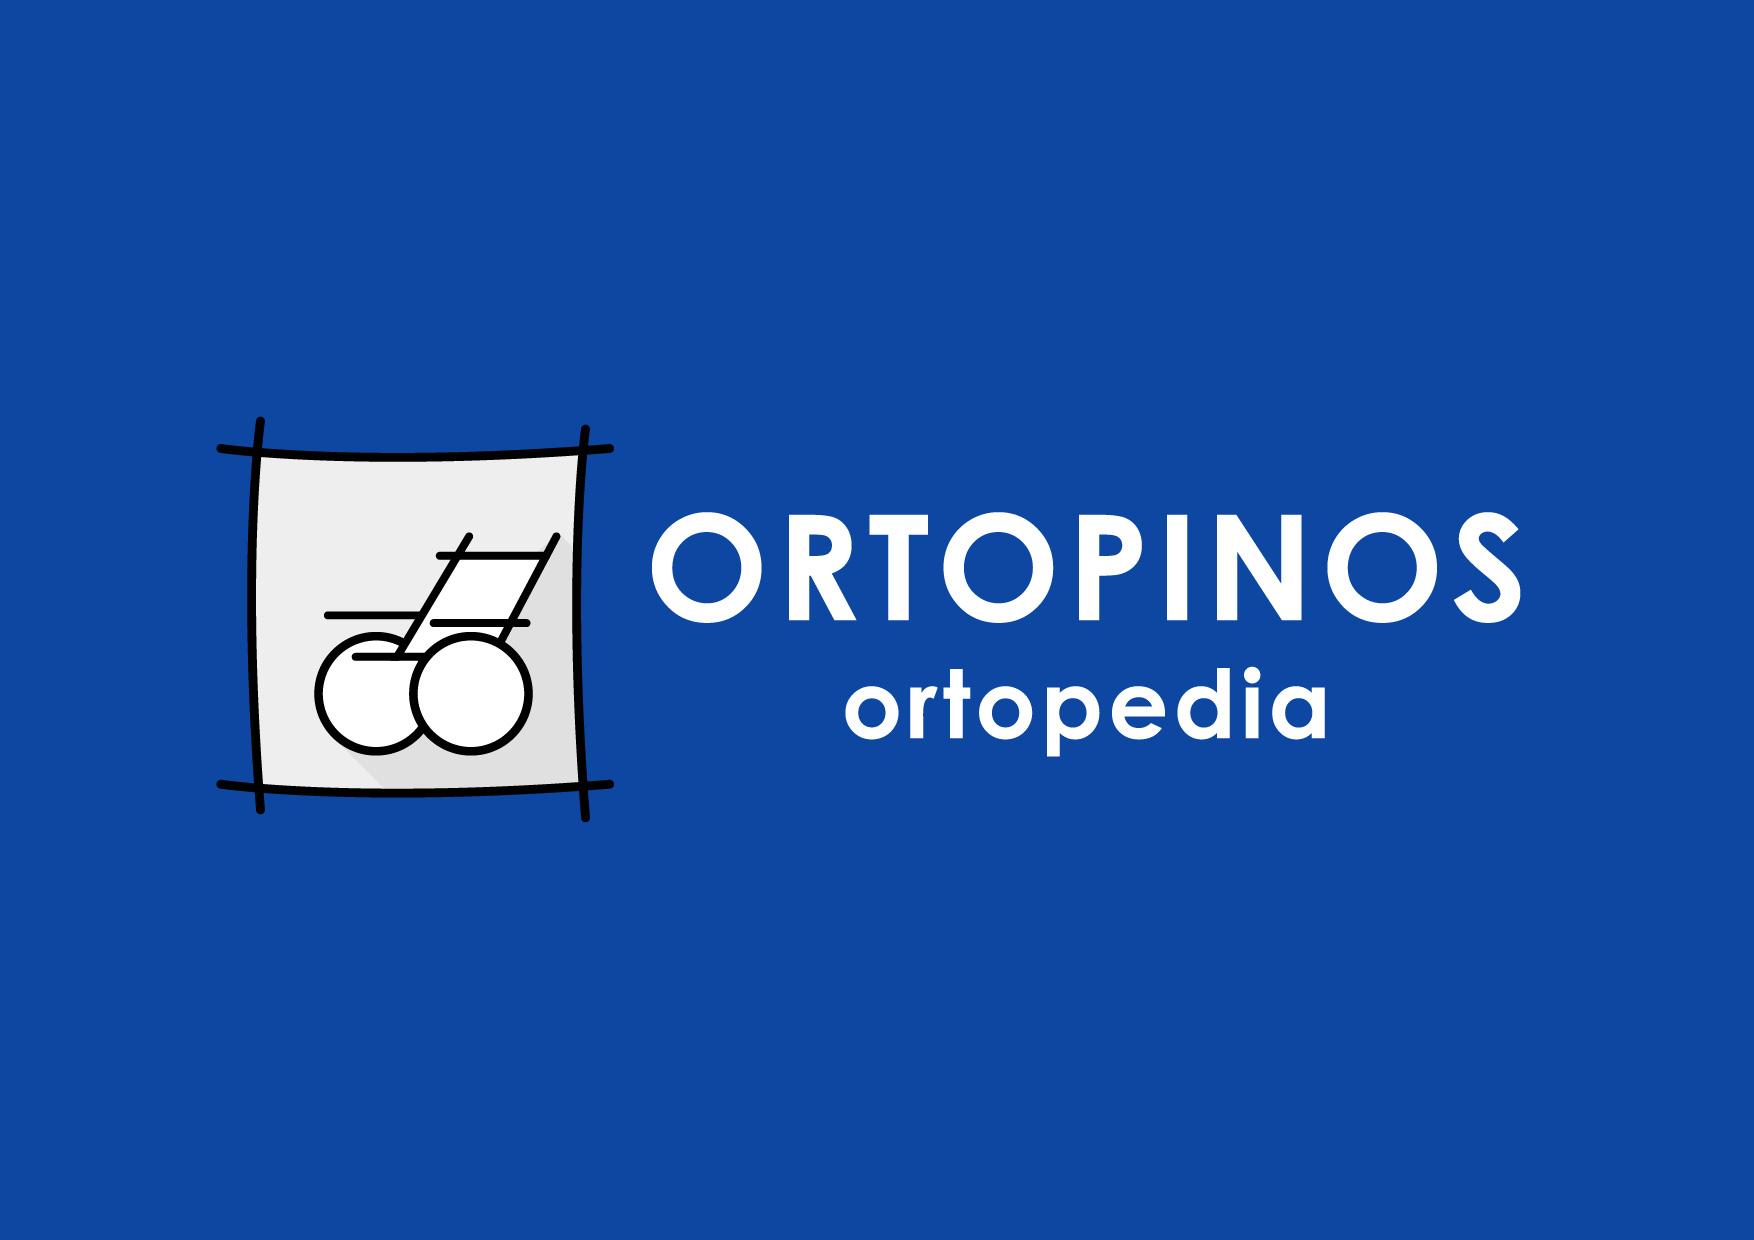 Logo comerç Ortopedia Ortopinos